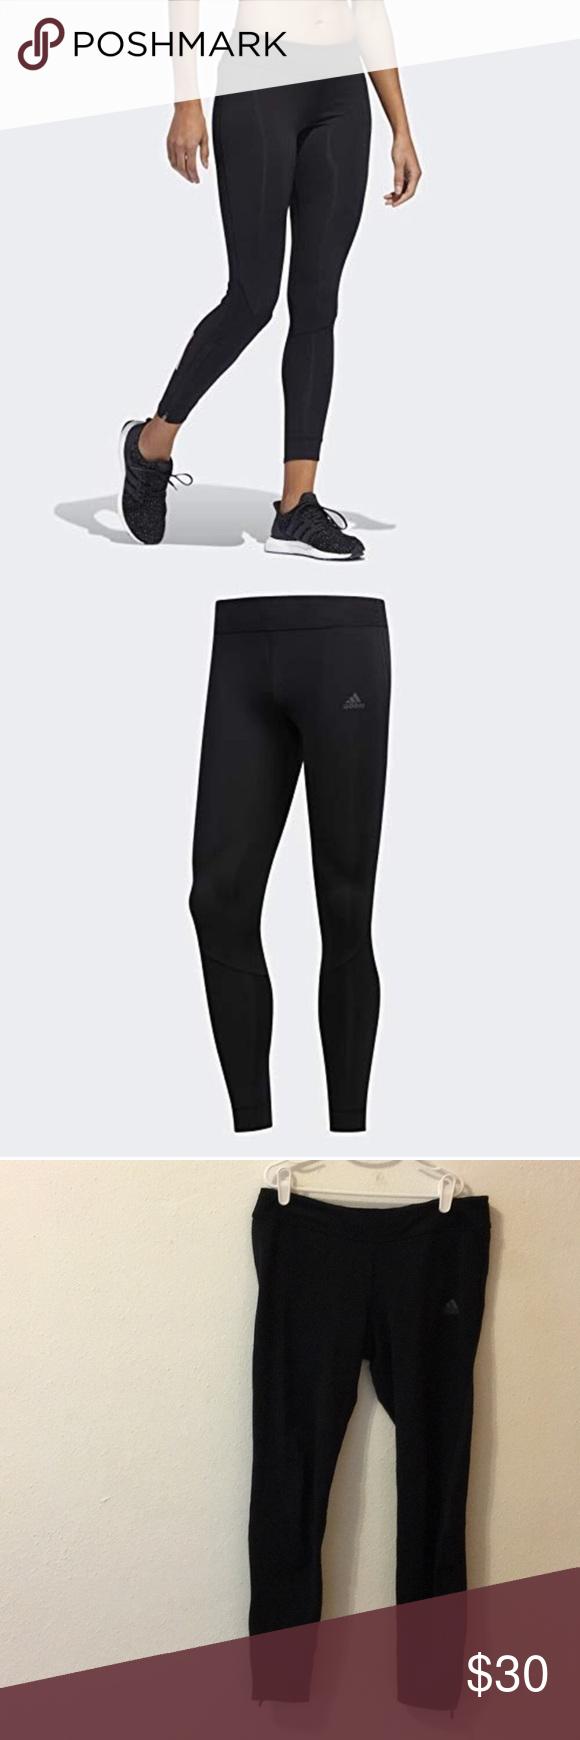 Adidas tights / leggings energy running